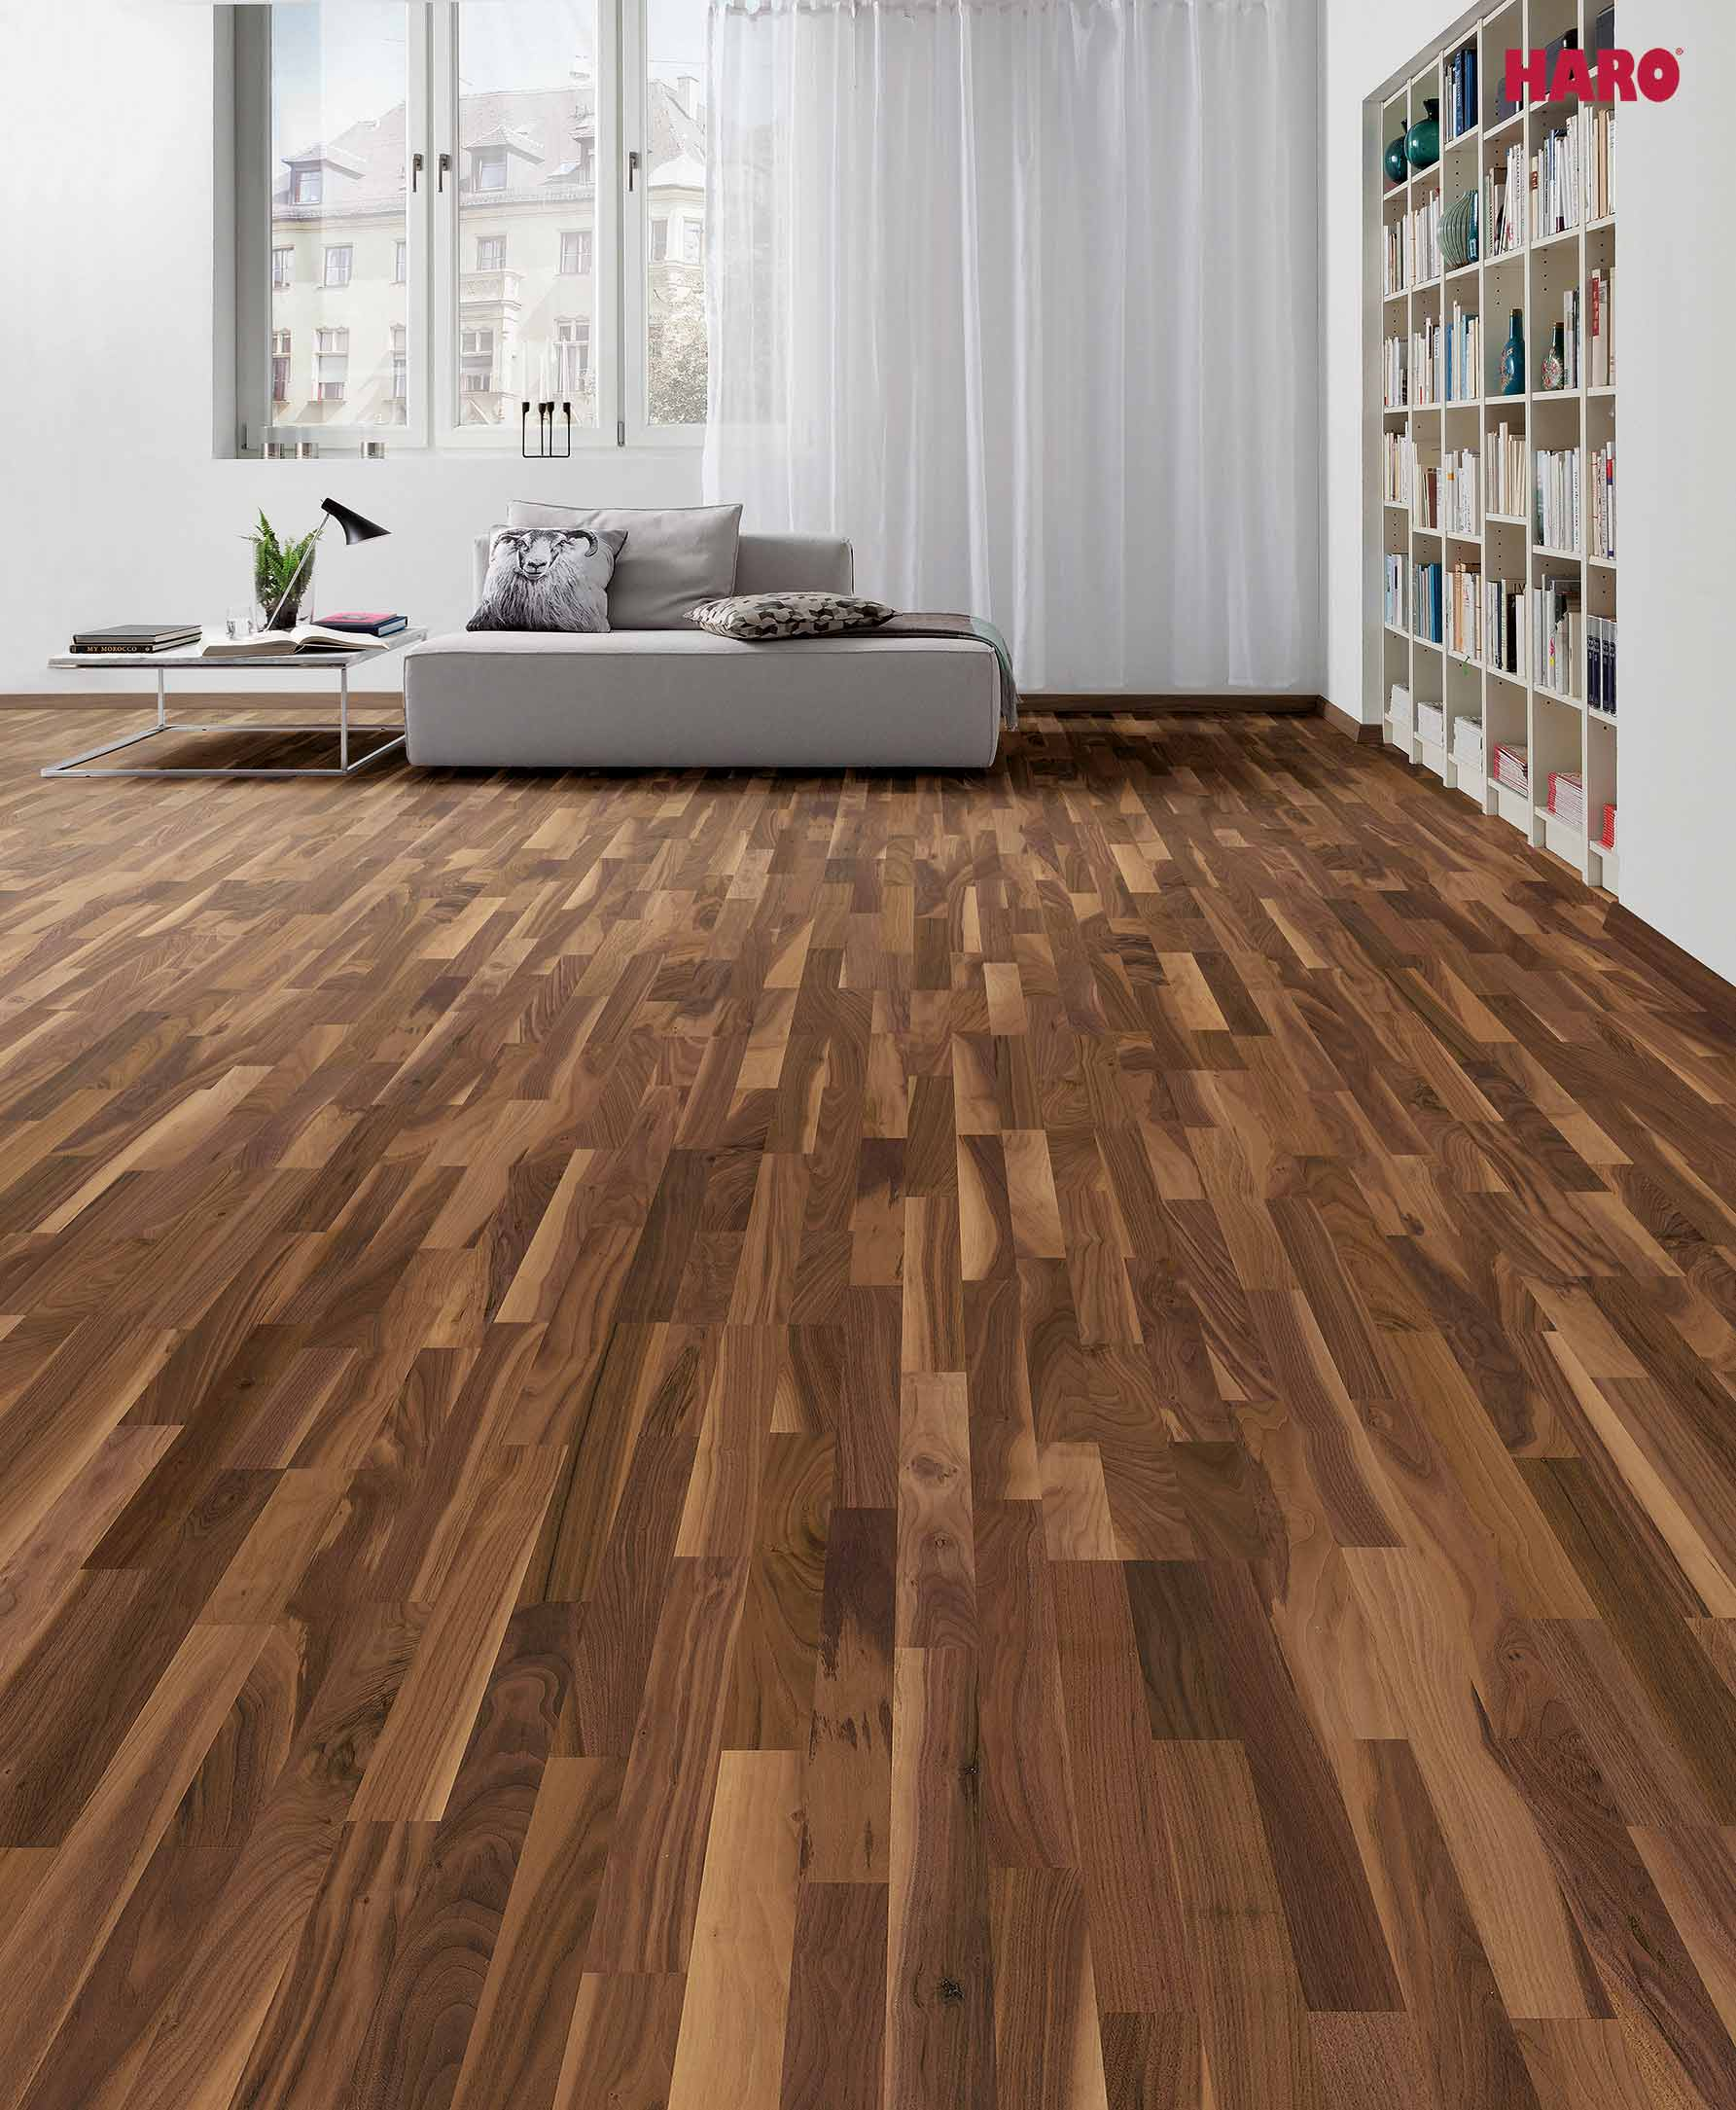 parkett nussbaum warmes ambiente daedelow parkett. Black Bedroom Furniture Sets. Home Design Ideas